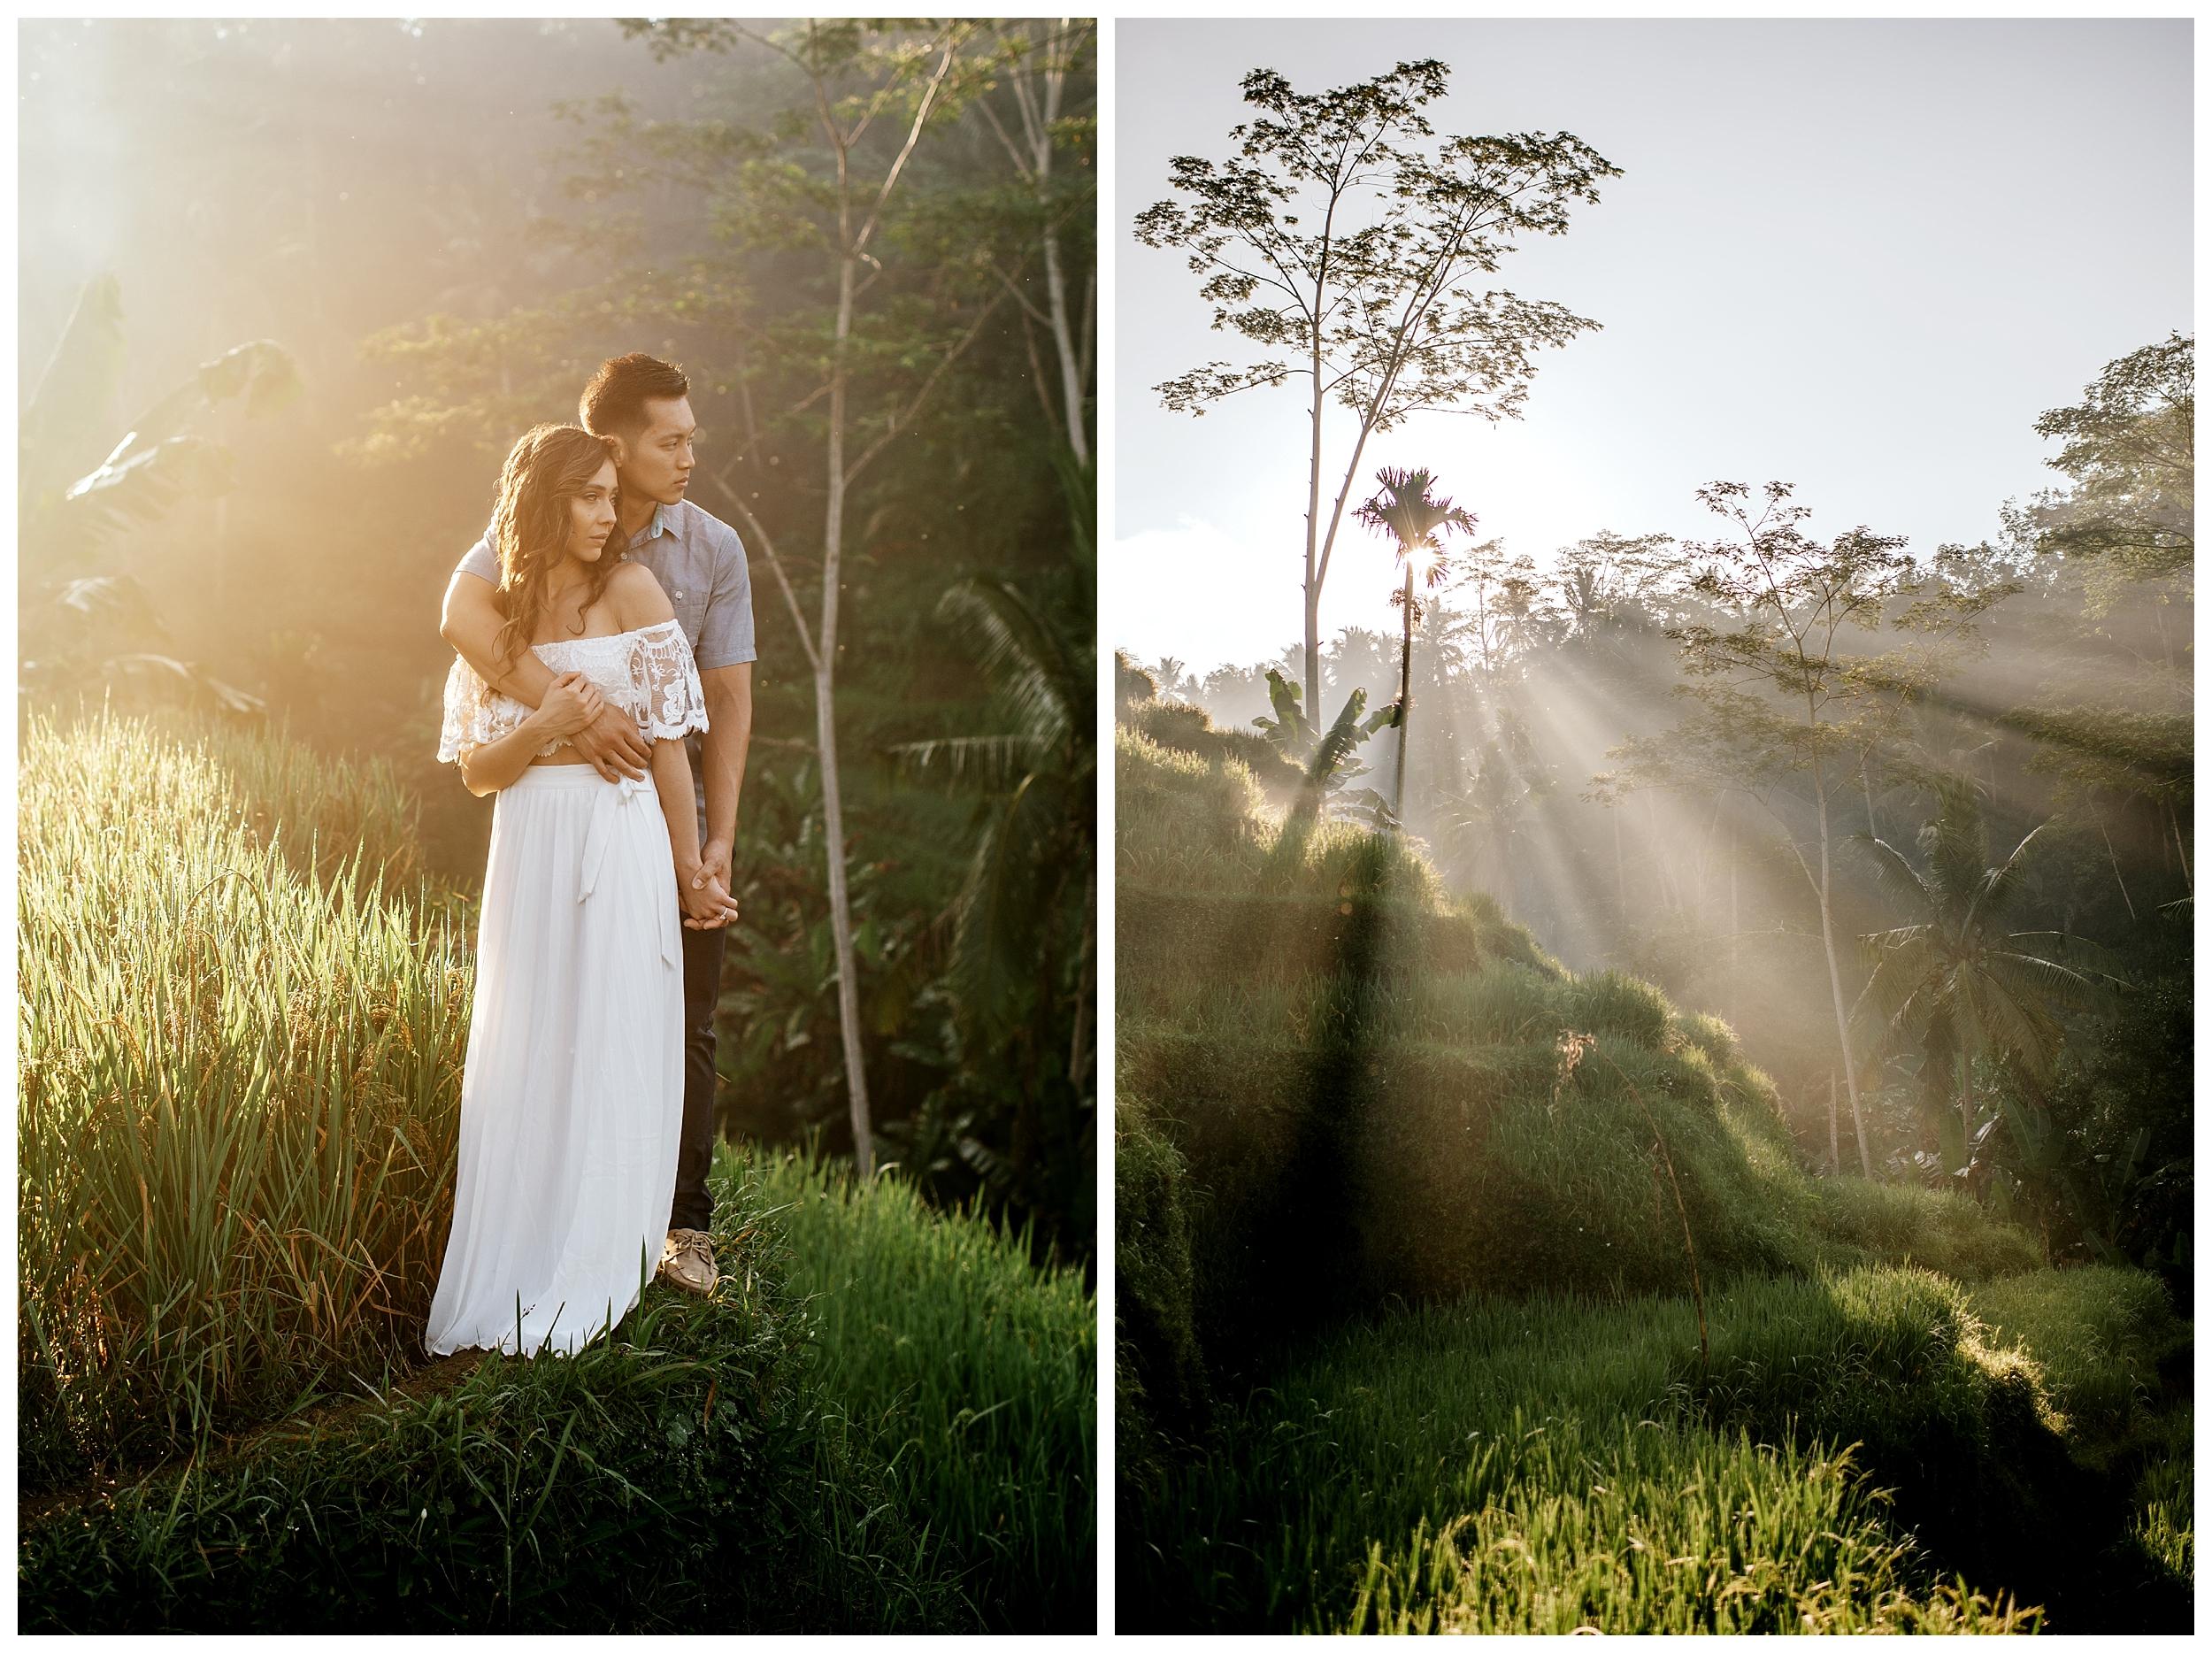 Tegalalang-rice-terrace-bali-engagement 22.jpg